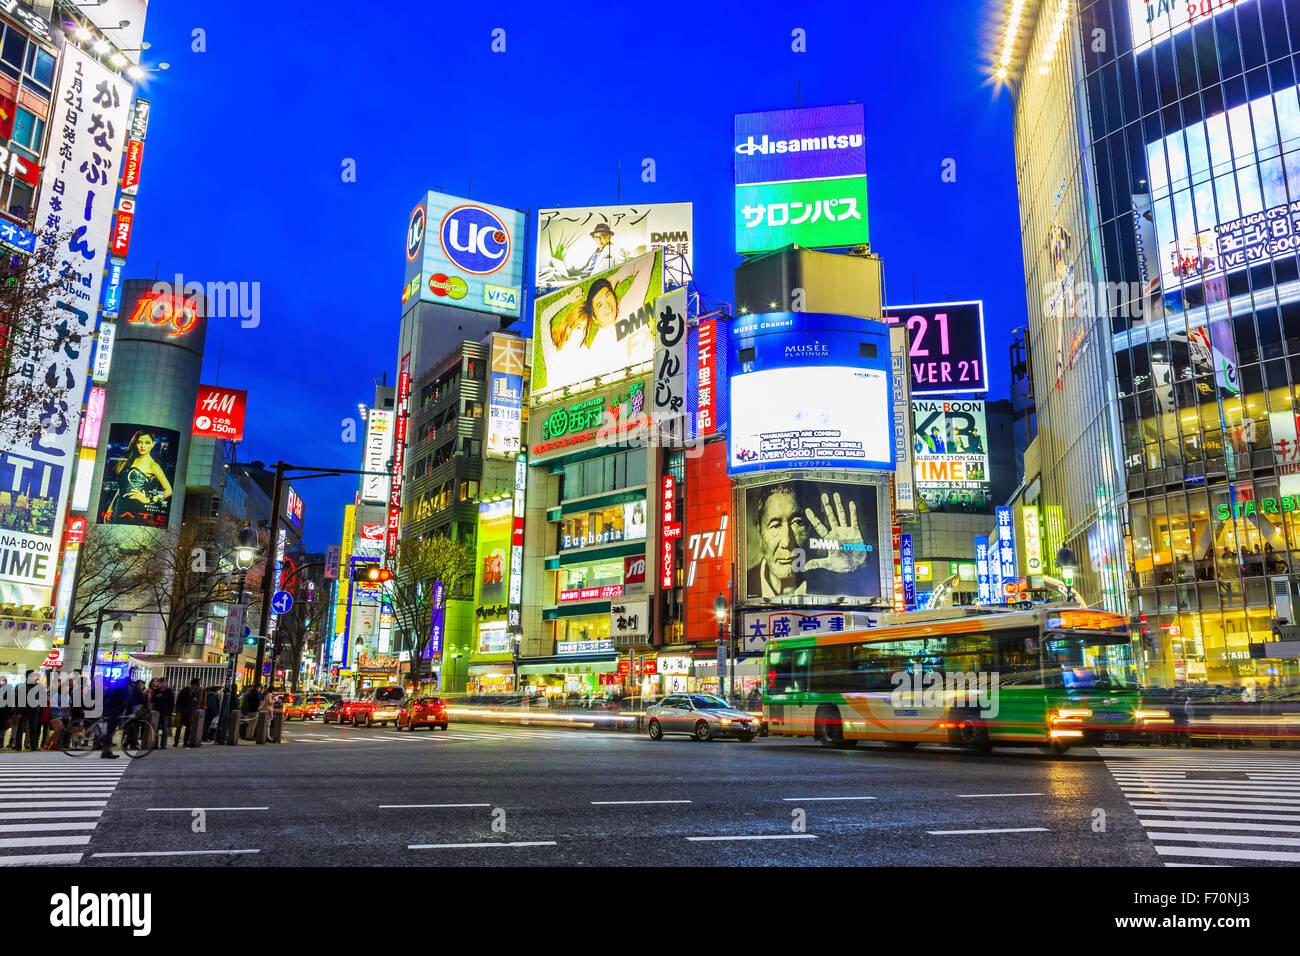 Tokyo, Shibuya. Il 30 gennaio 2015. Il quartiere Shibuya di Tokyo. Shibuya è il quartiere popolare di Tokyo, per Foto Stock